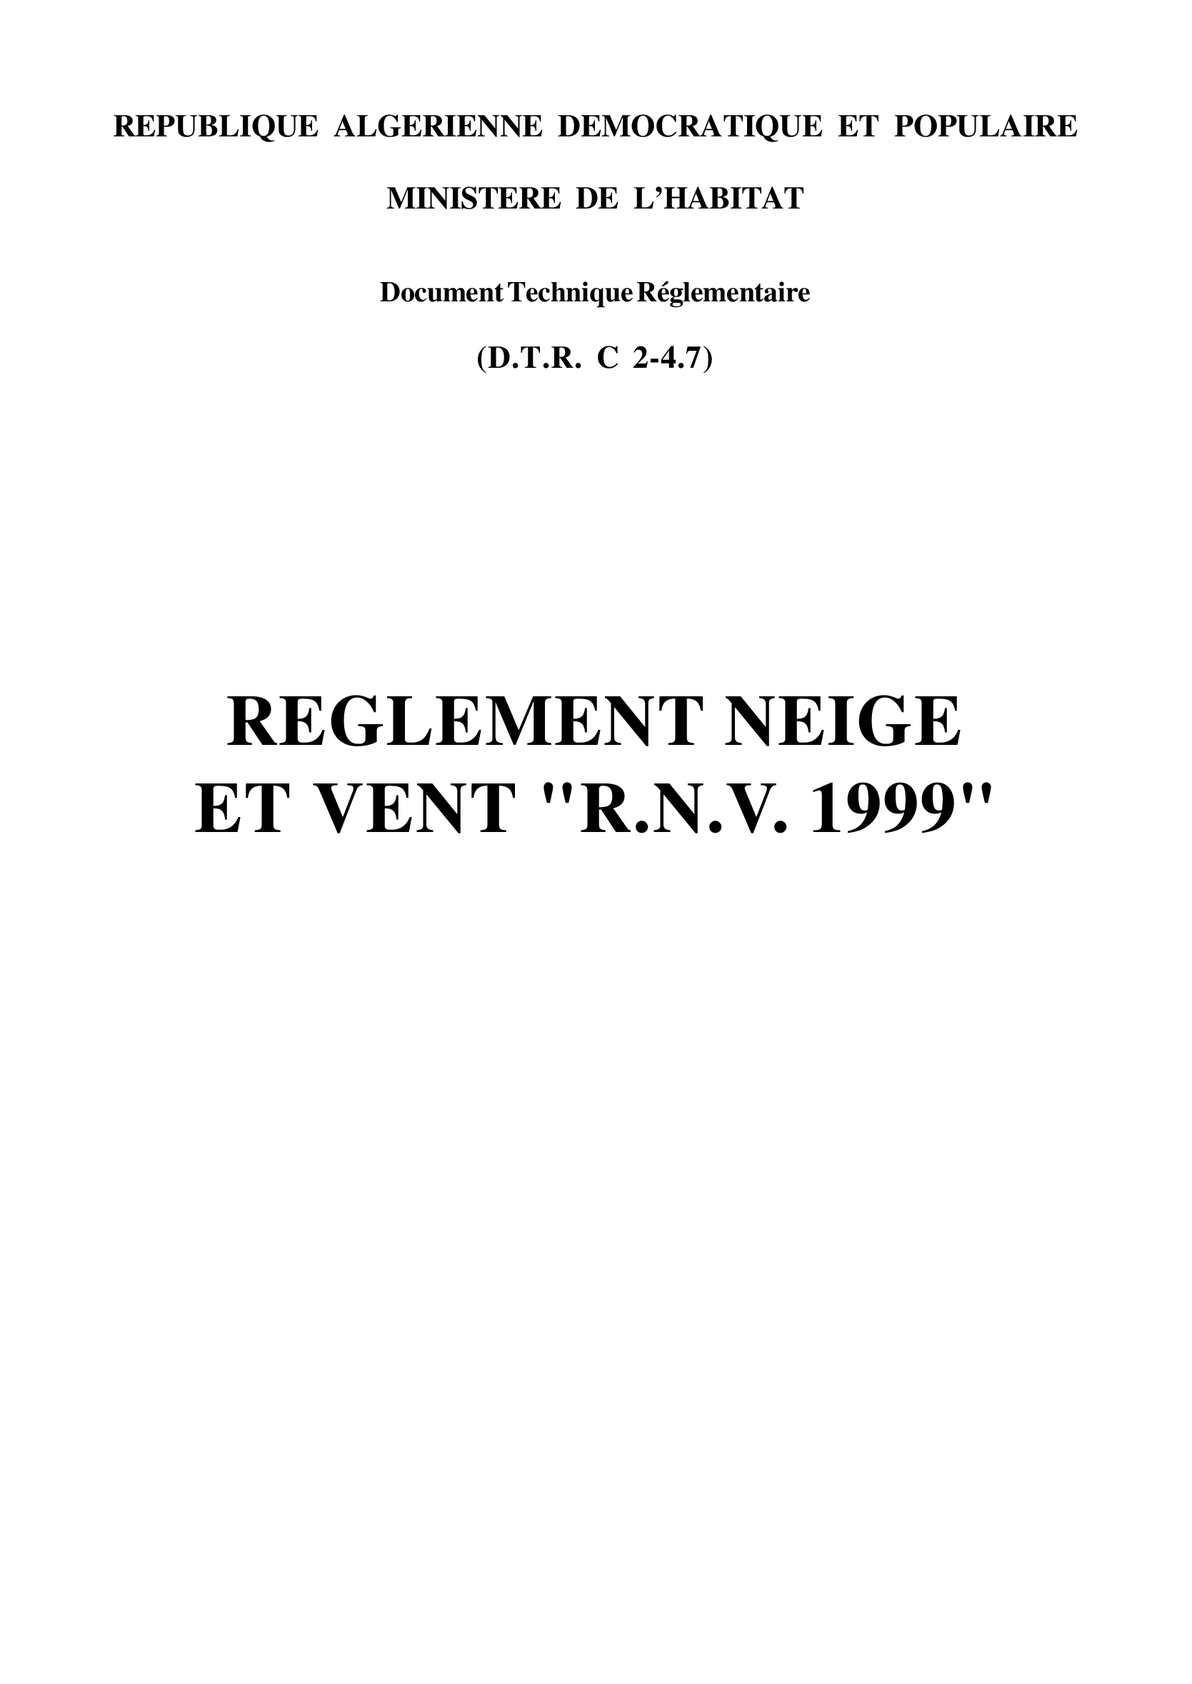 C 2-4.7 Règlement Neige et Vent Algerien R.N.V.A 1999